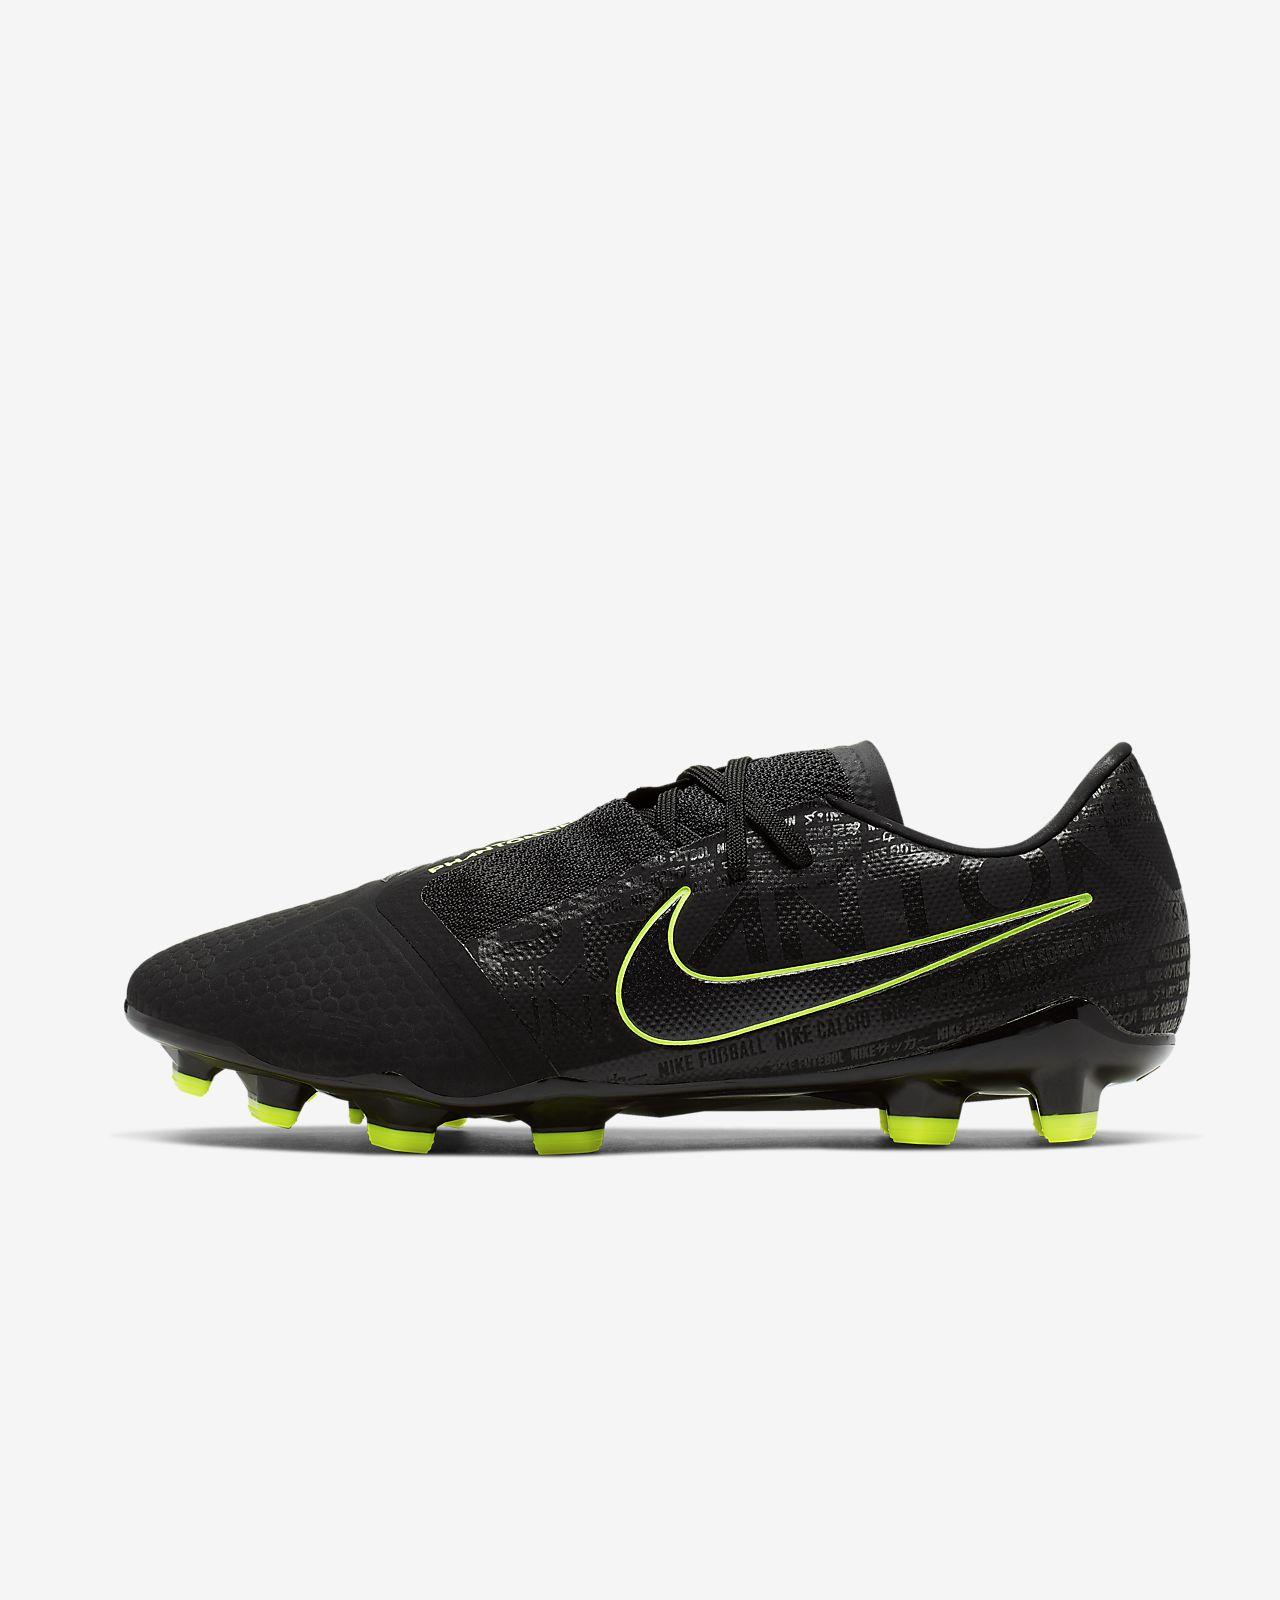 Nike Phantom Venom Pro FG Botas de fútbol para terreno firme